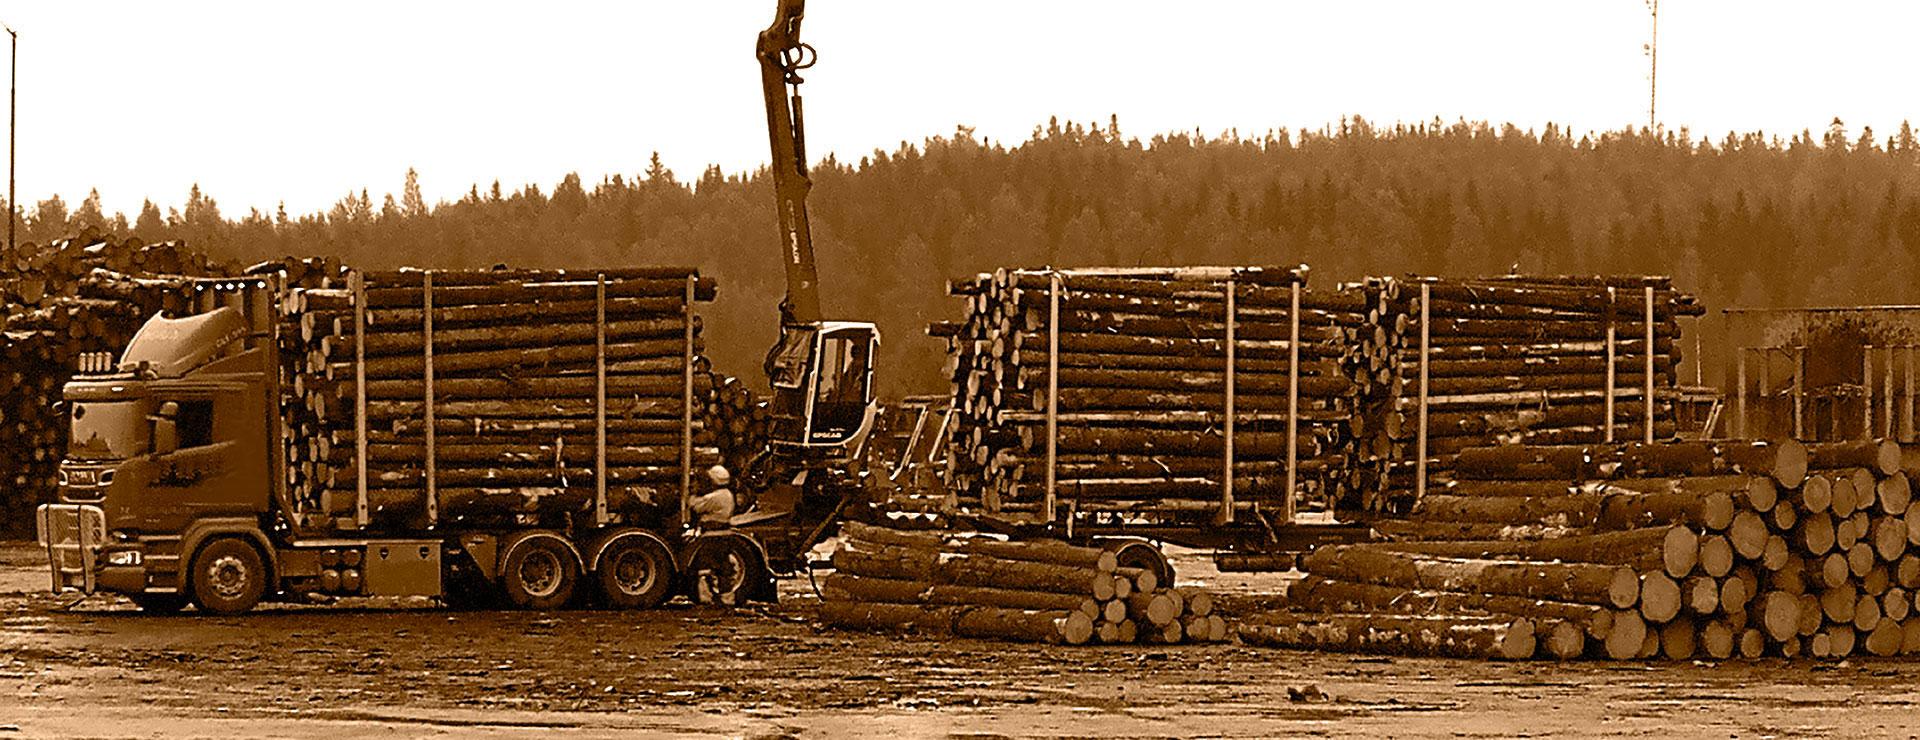 Transporting finnish wood